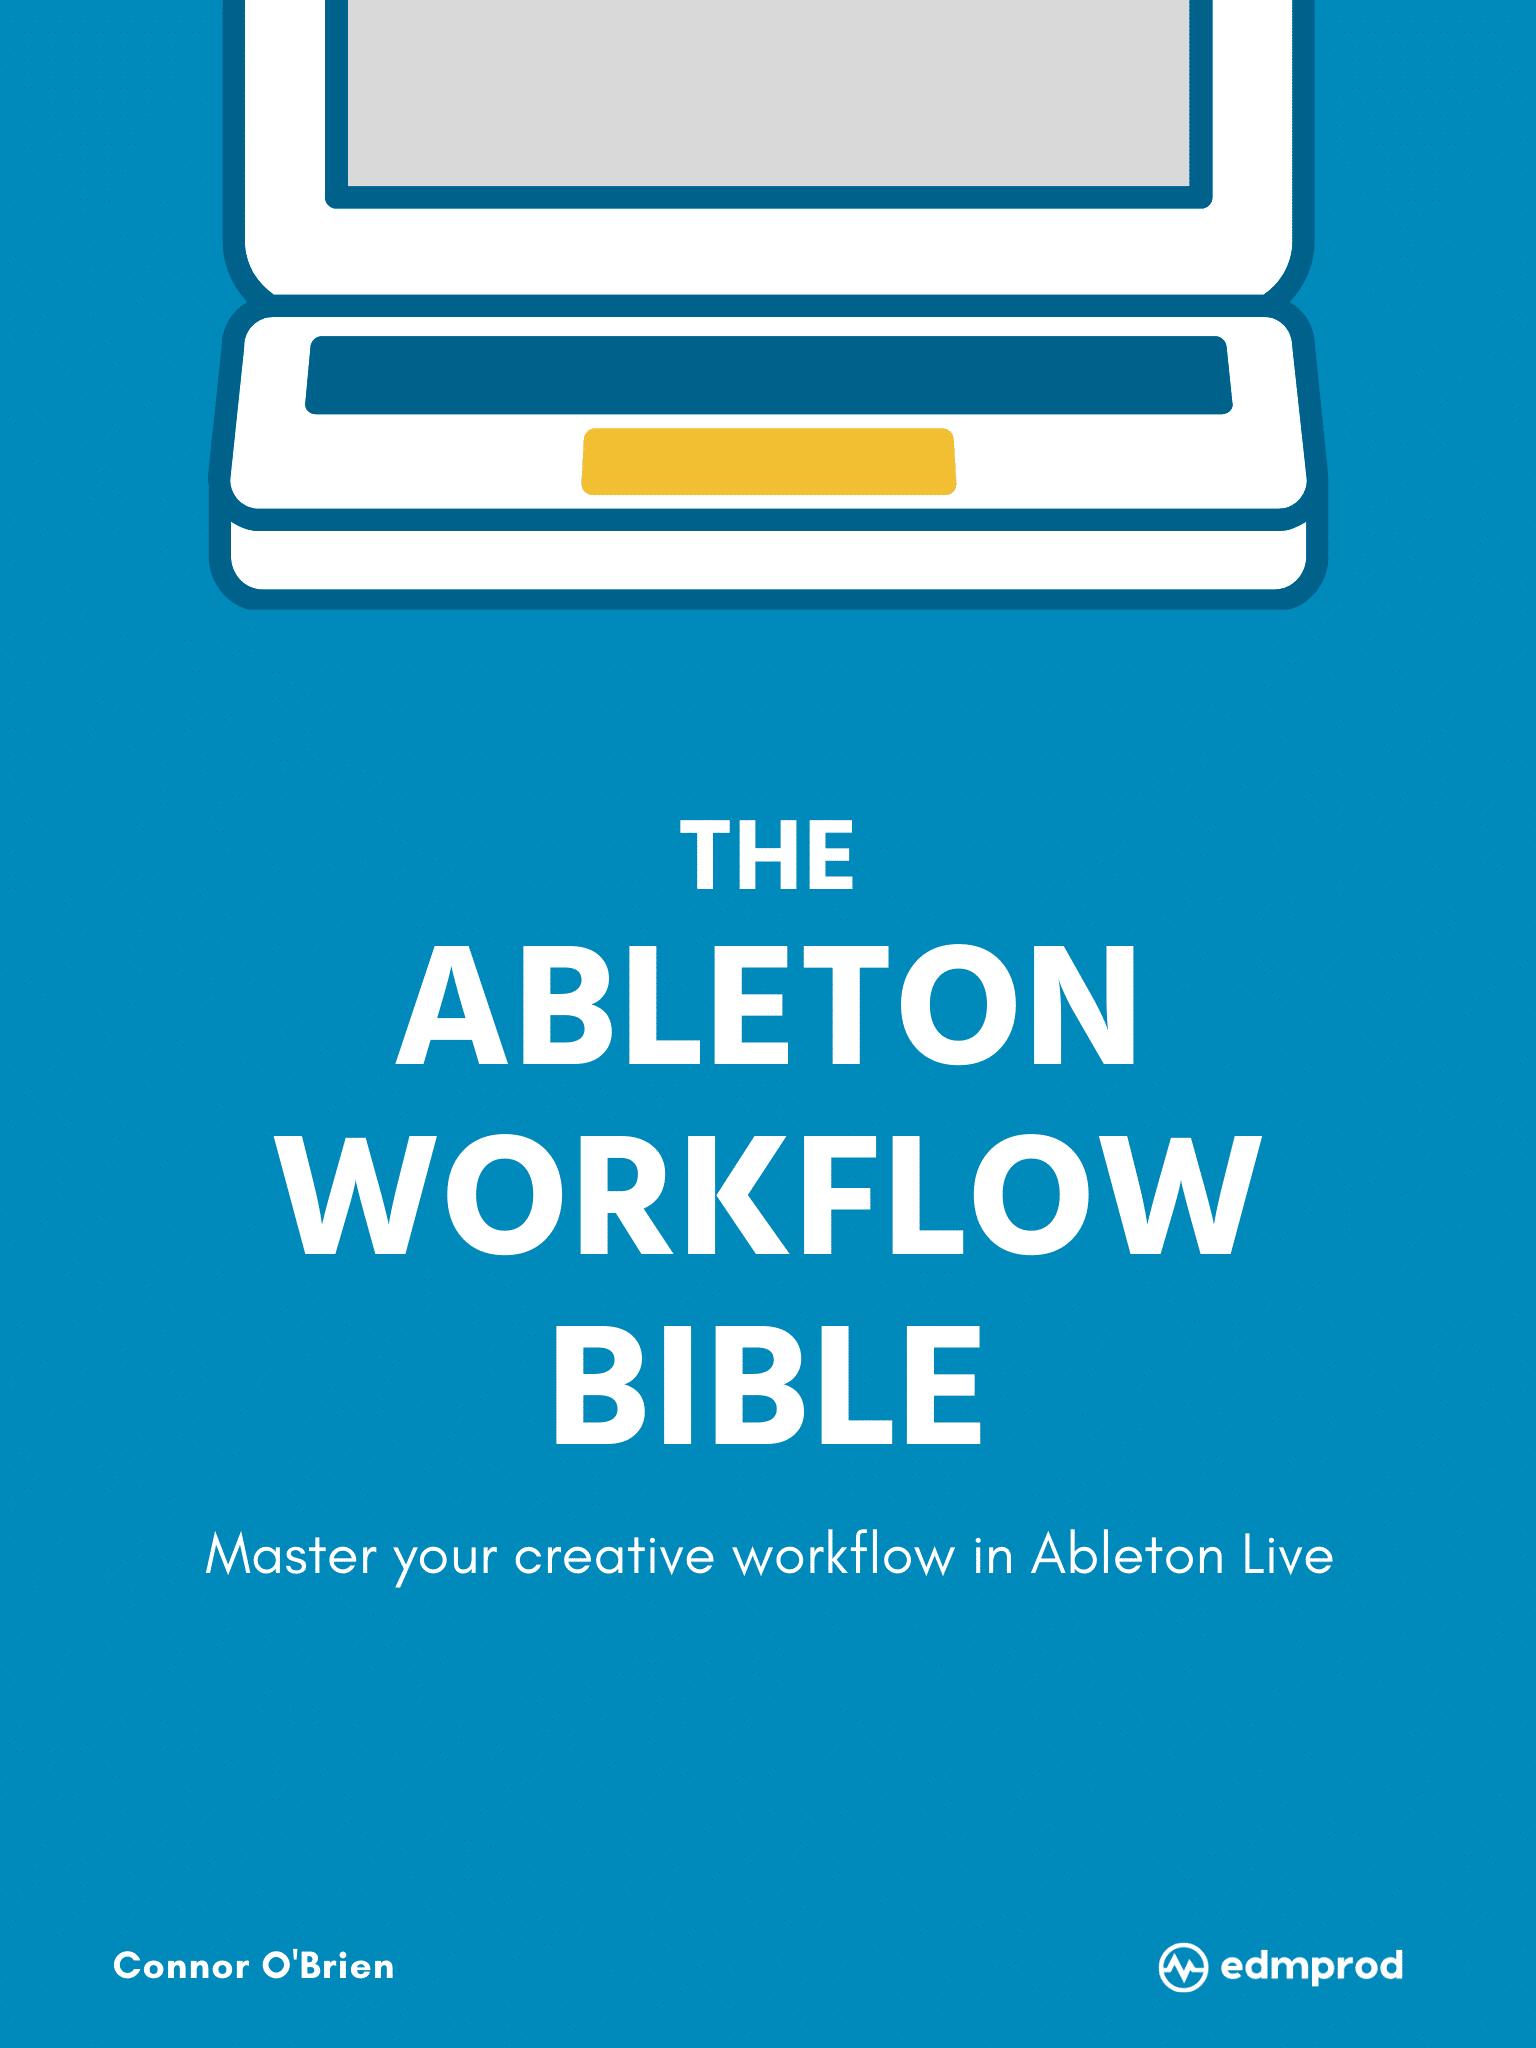 Ableton Workflow Bible 2021